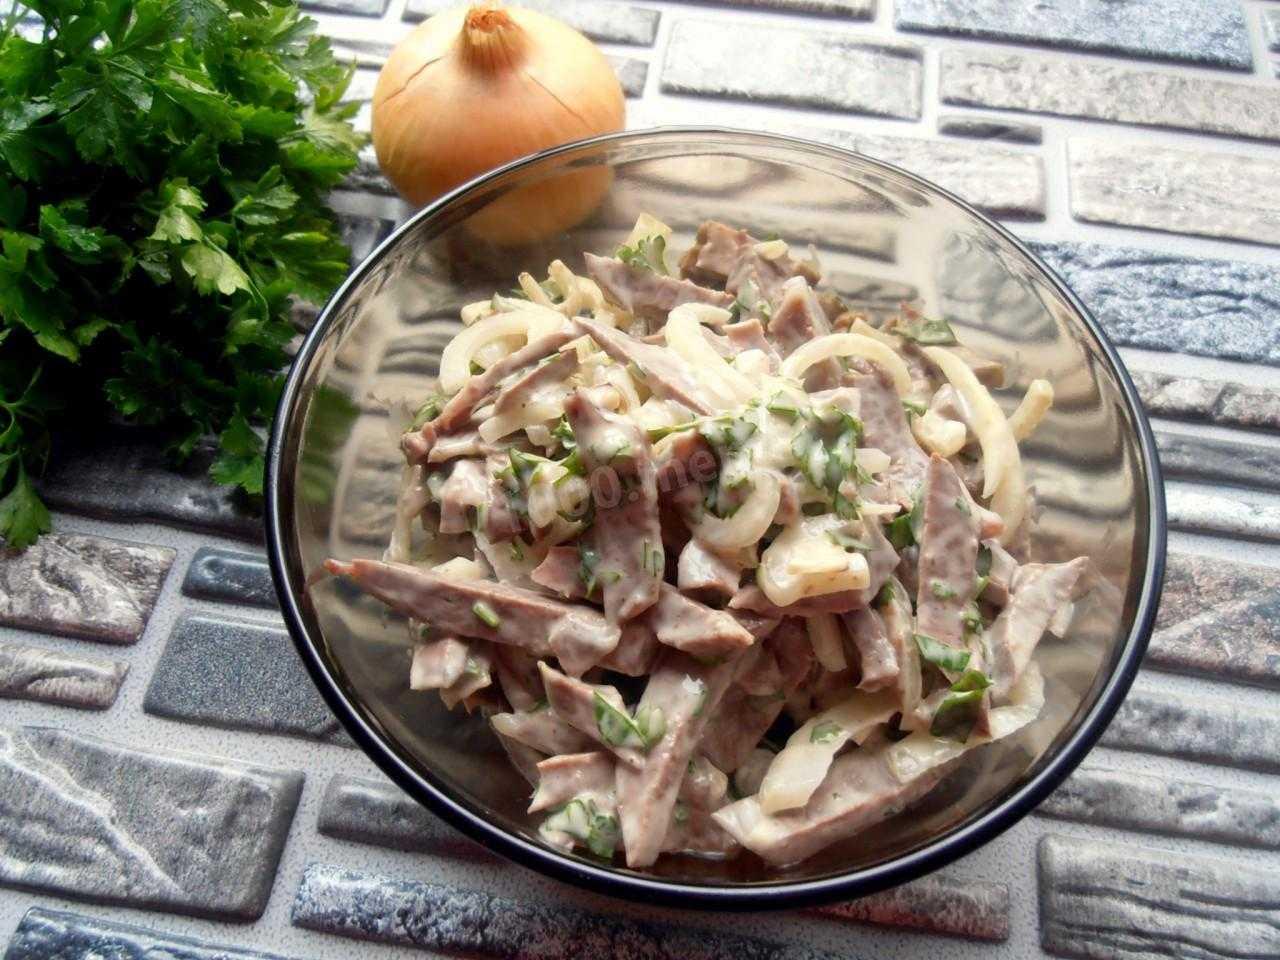 Салат из свиного сердца: рецепты с фото пошагово